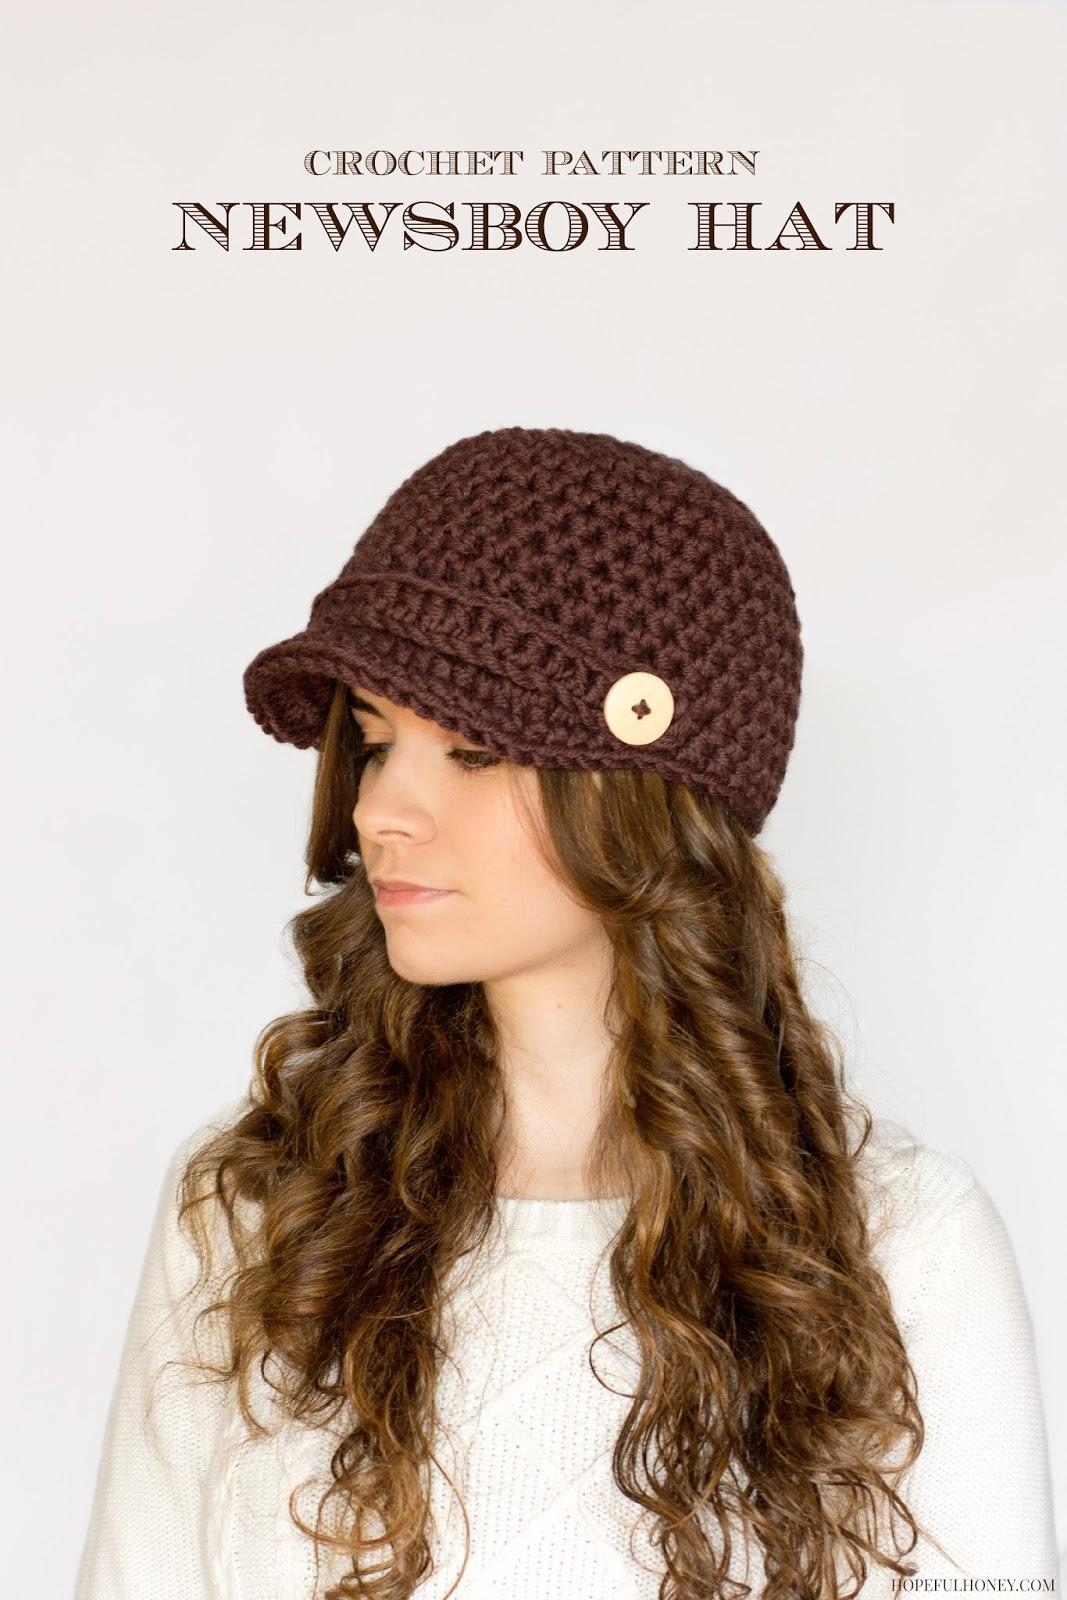 Hopeful Honey Craft, Crochet, Create: 10 Free